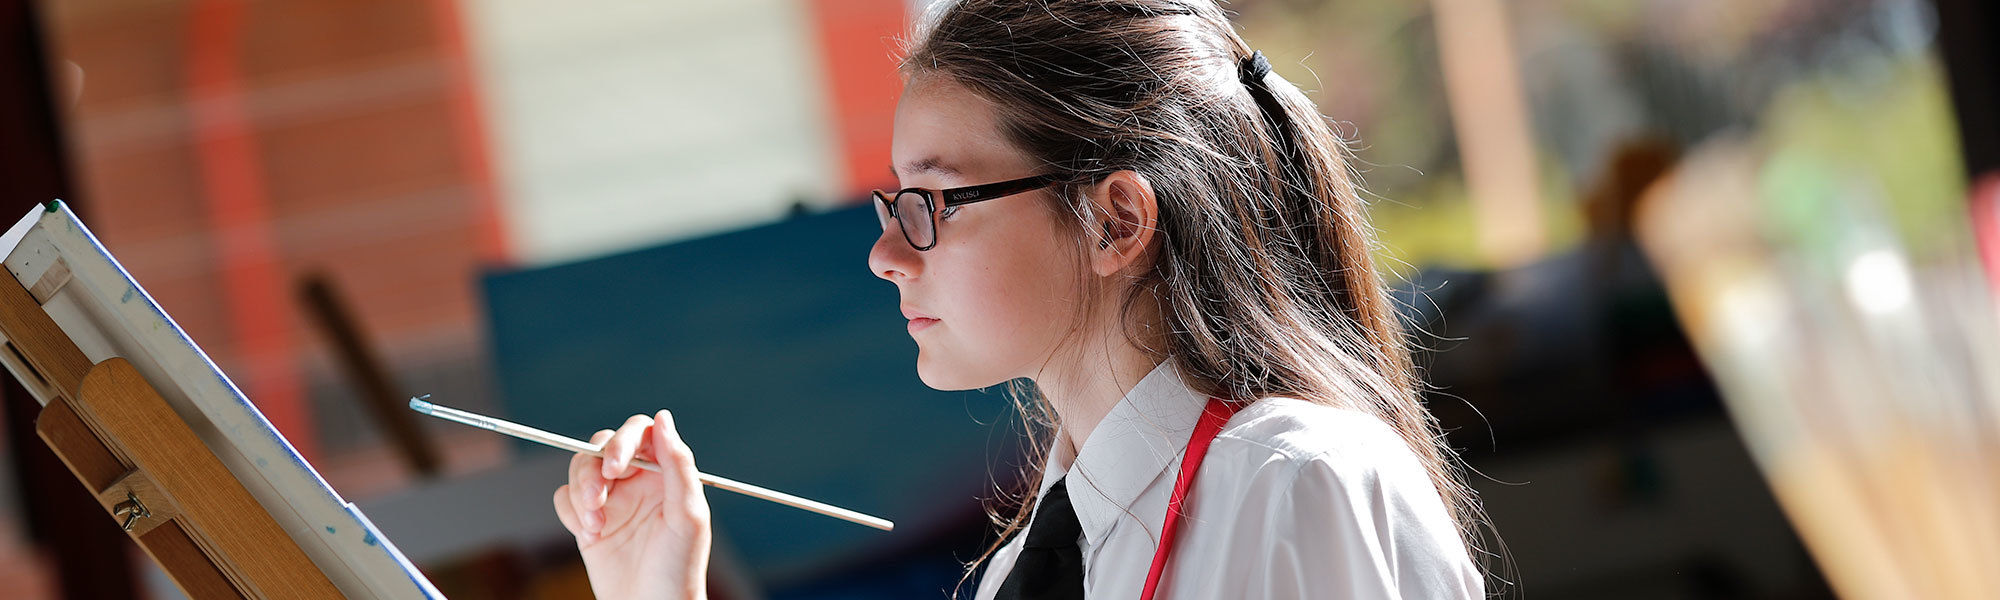 Bourne Education Trust Image 4